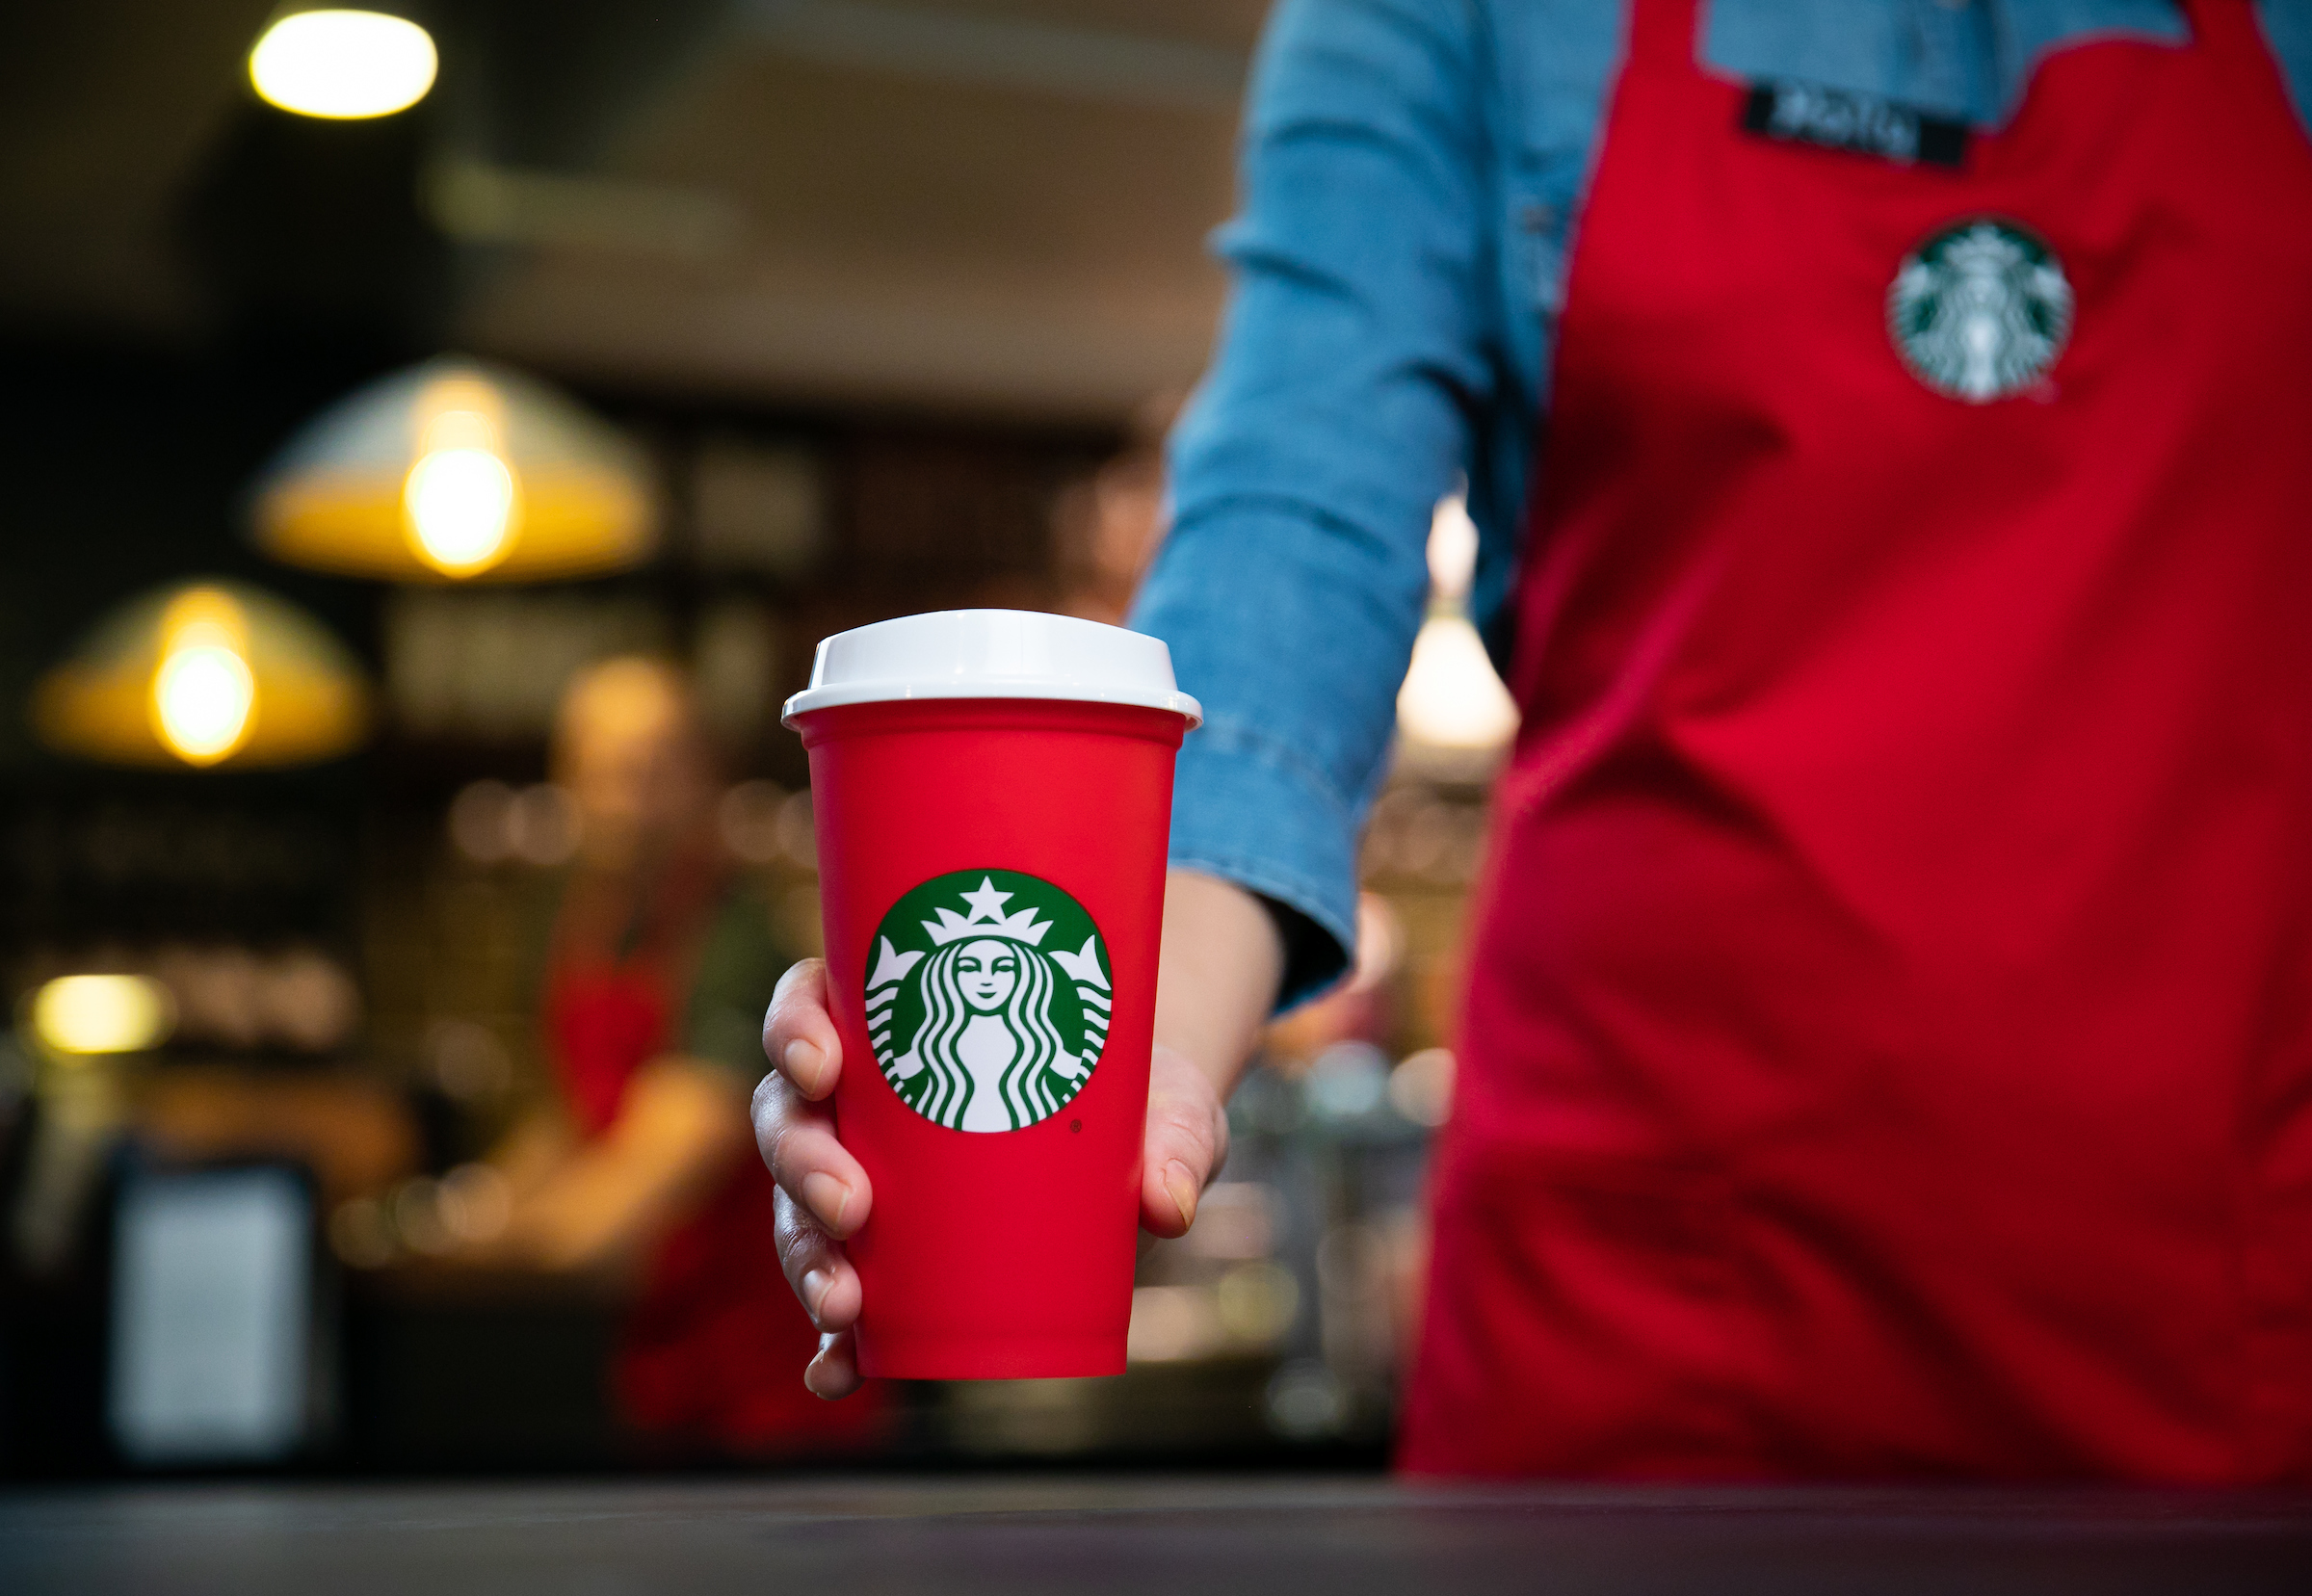 Starbucks Reusable Cup Is Given A Make Over For Christmas